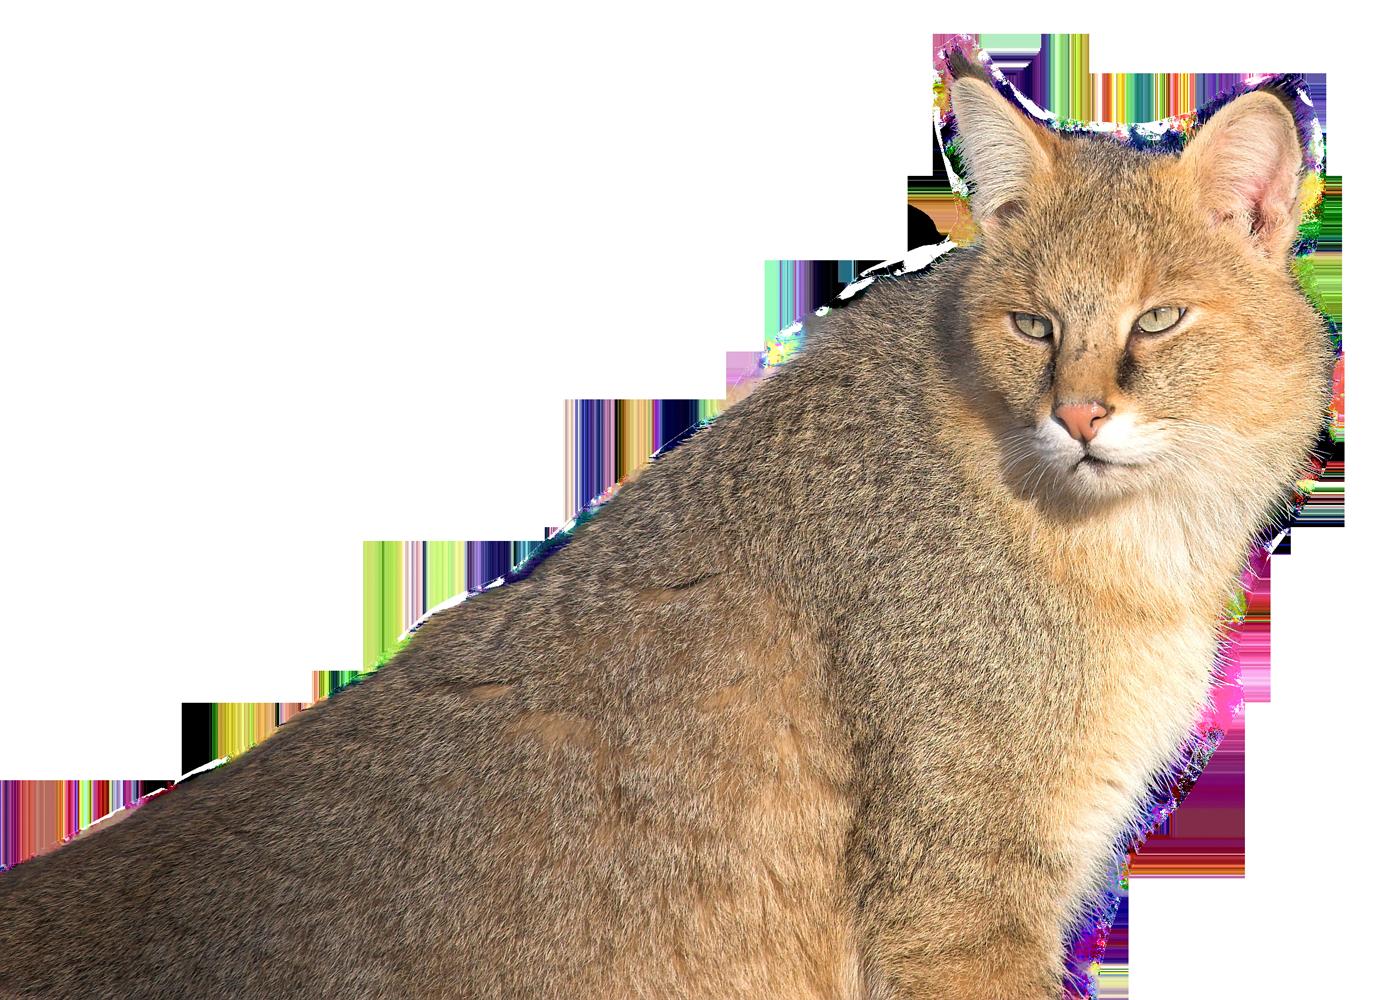 Jungle cat clipart picture library Jungle Cat PNG Image - PurePNG | Free transparent CC0 PNG Image Library picture library